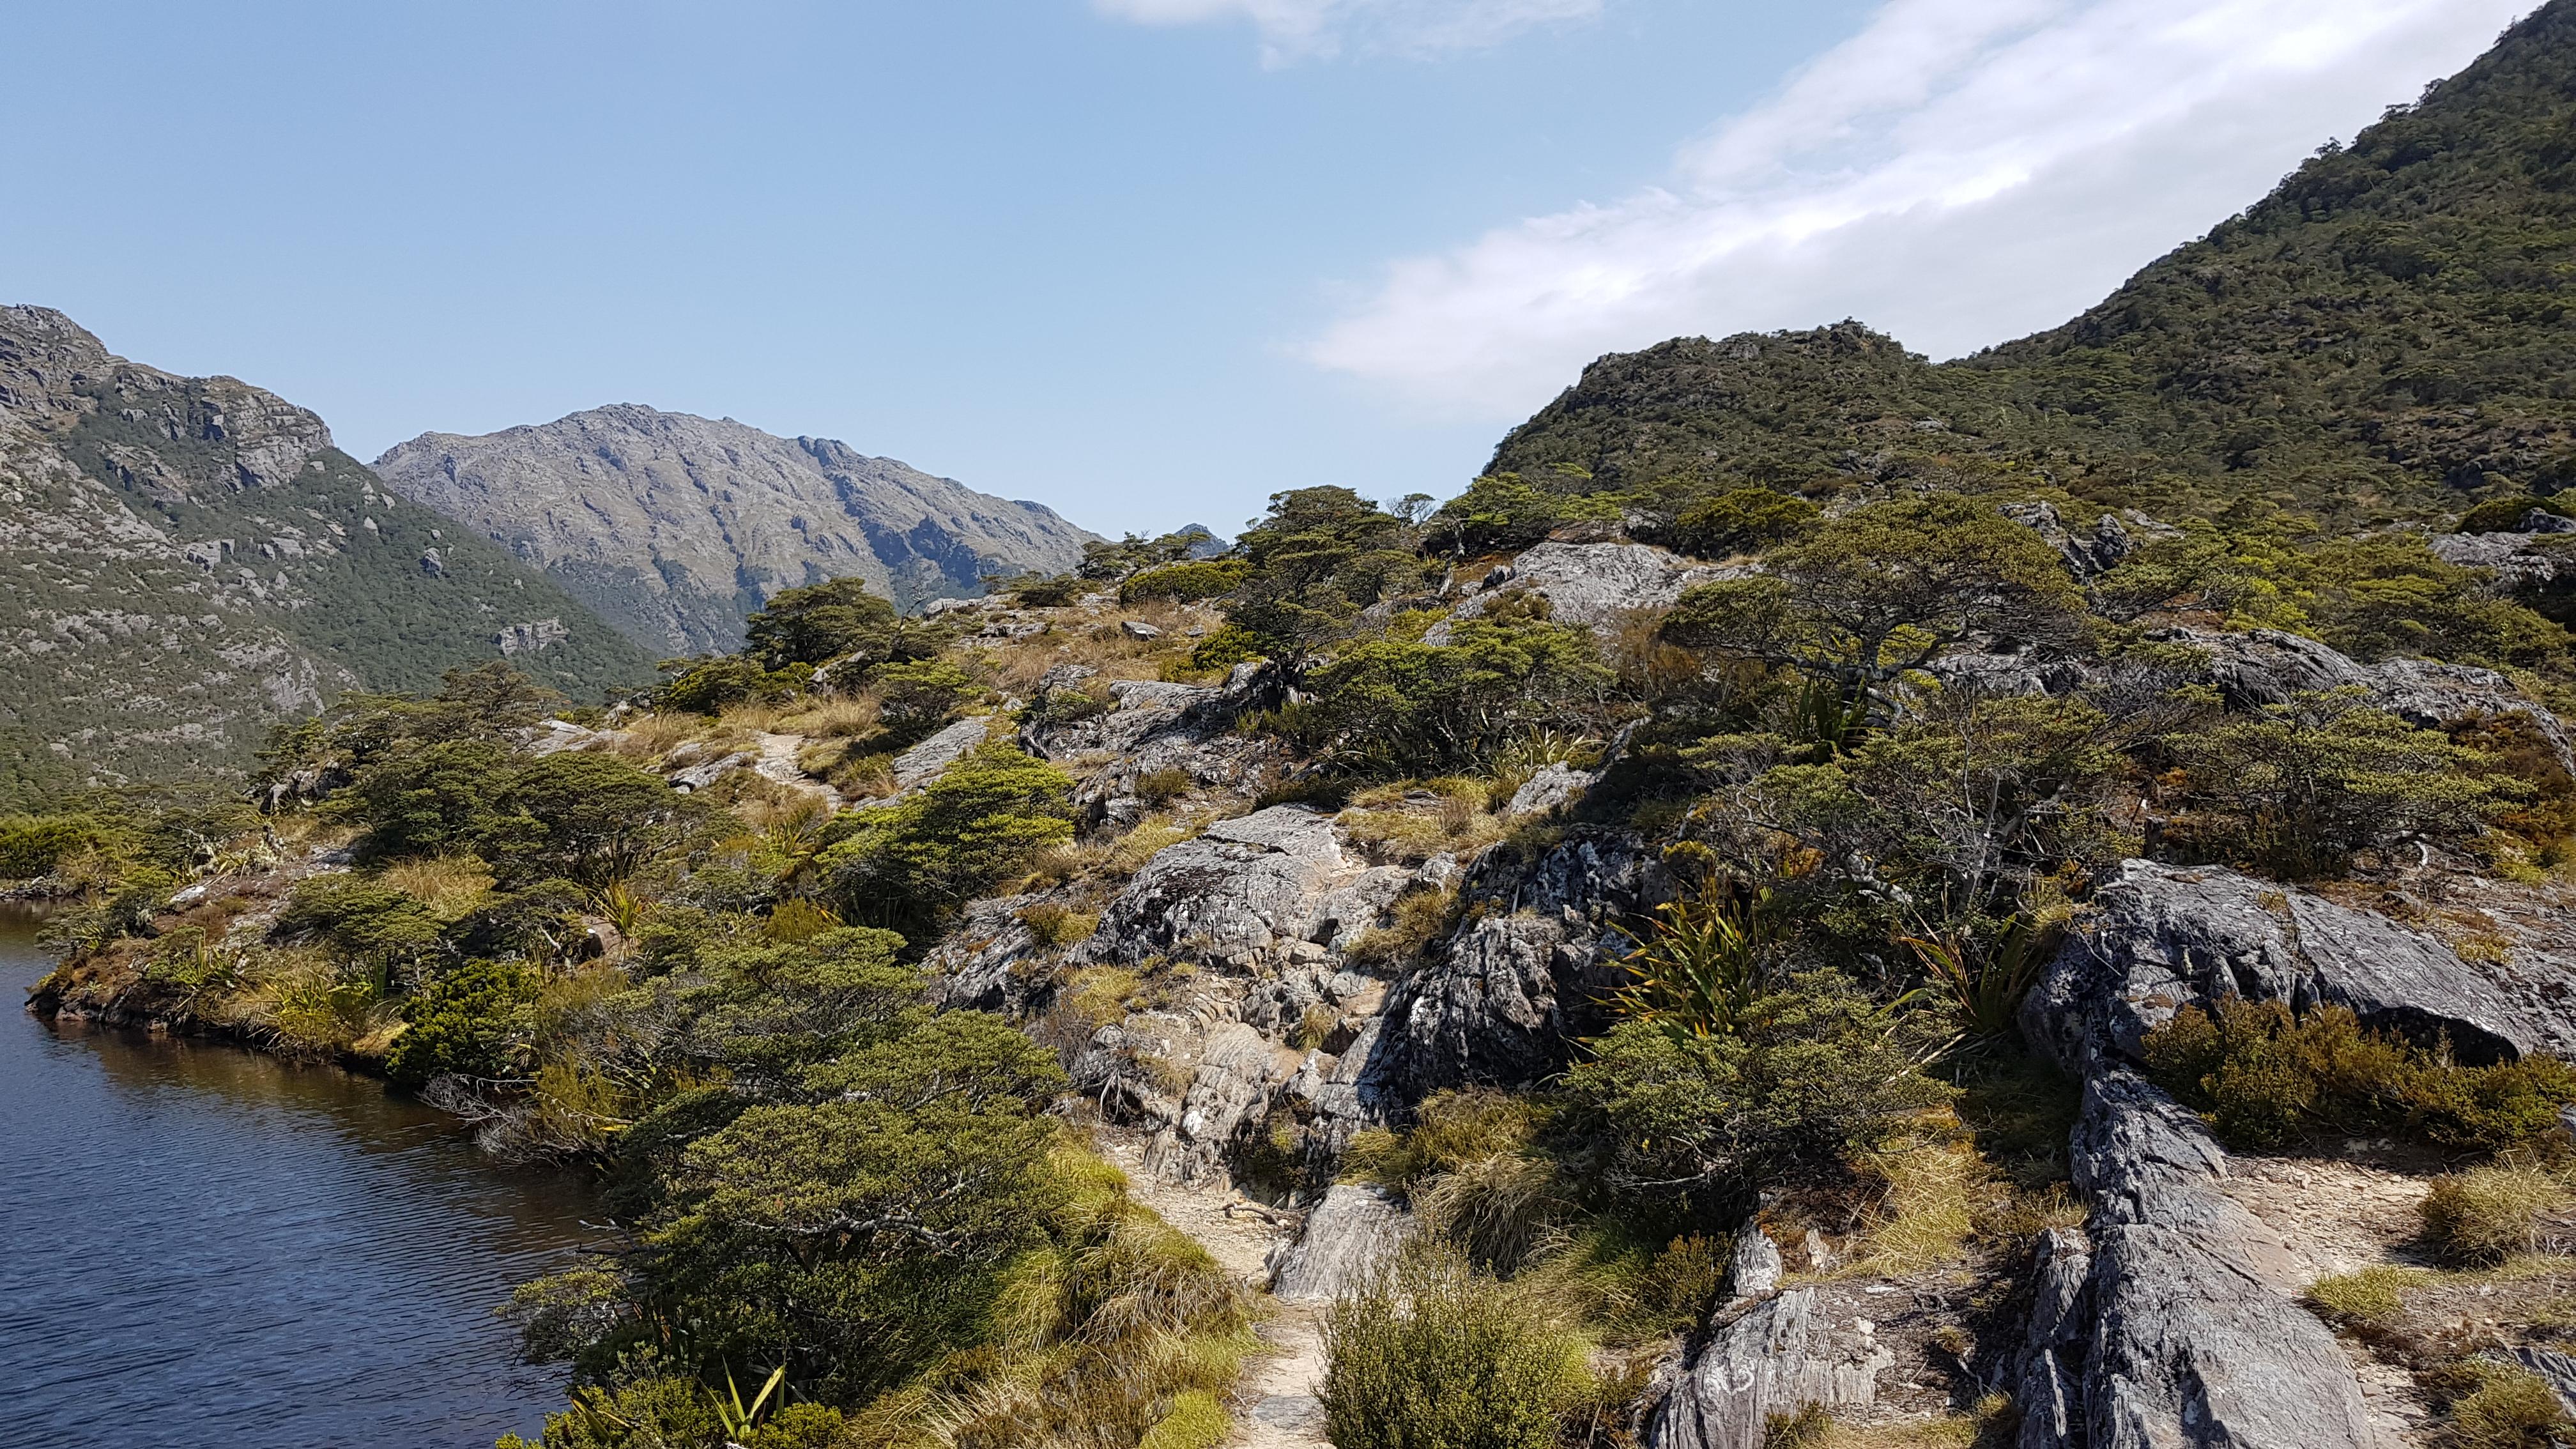 The tarn near Fenella hut